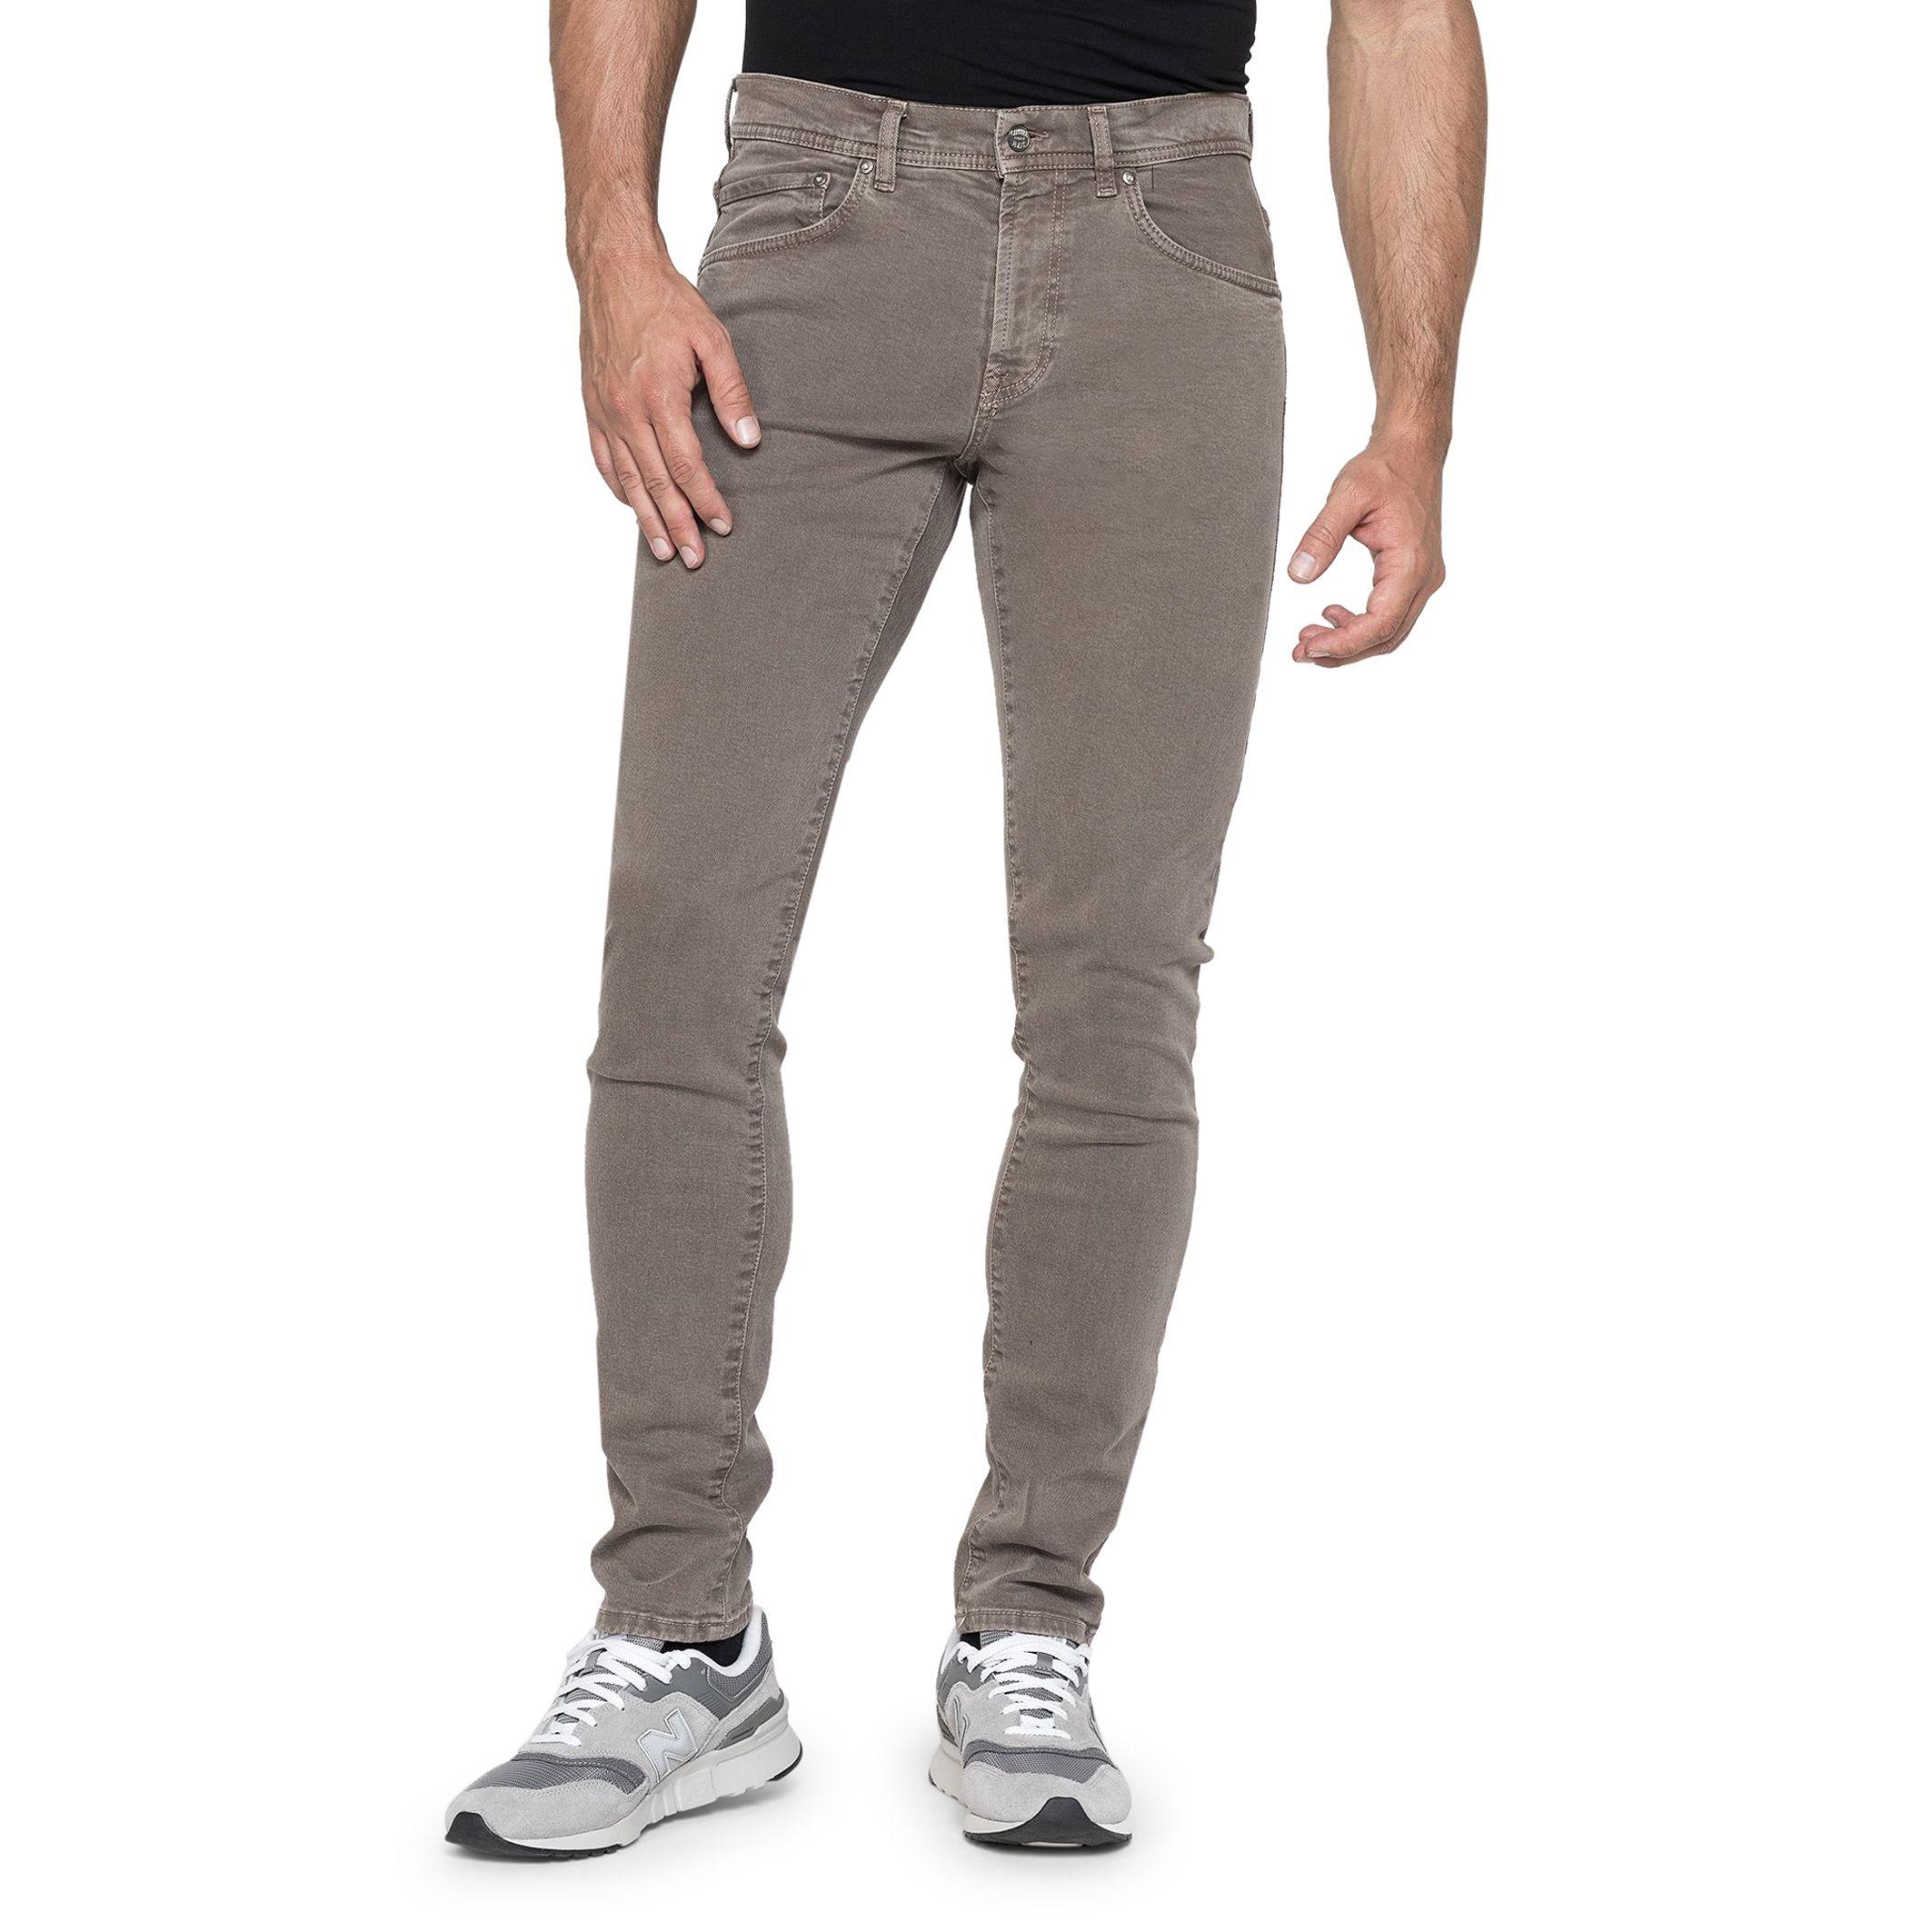 Carrera Jeans – 717_8302S